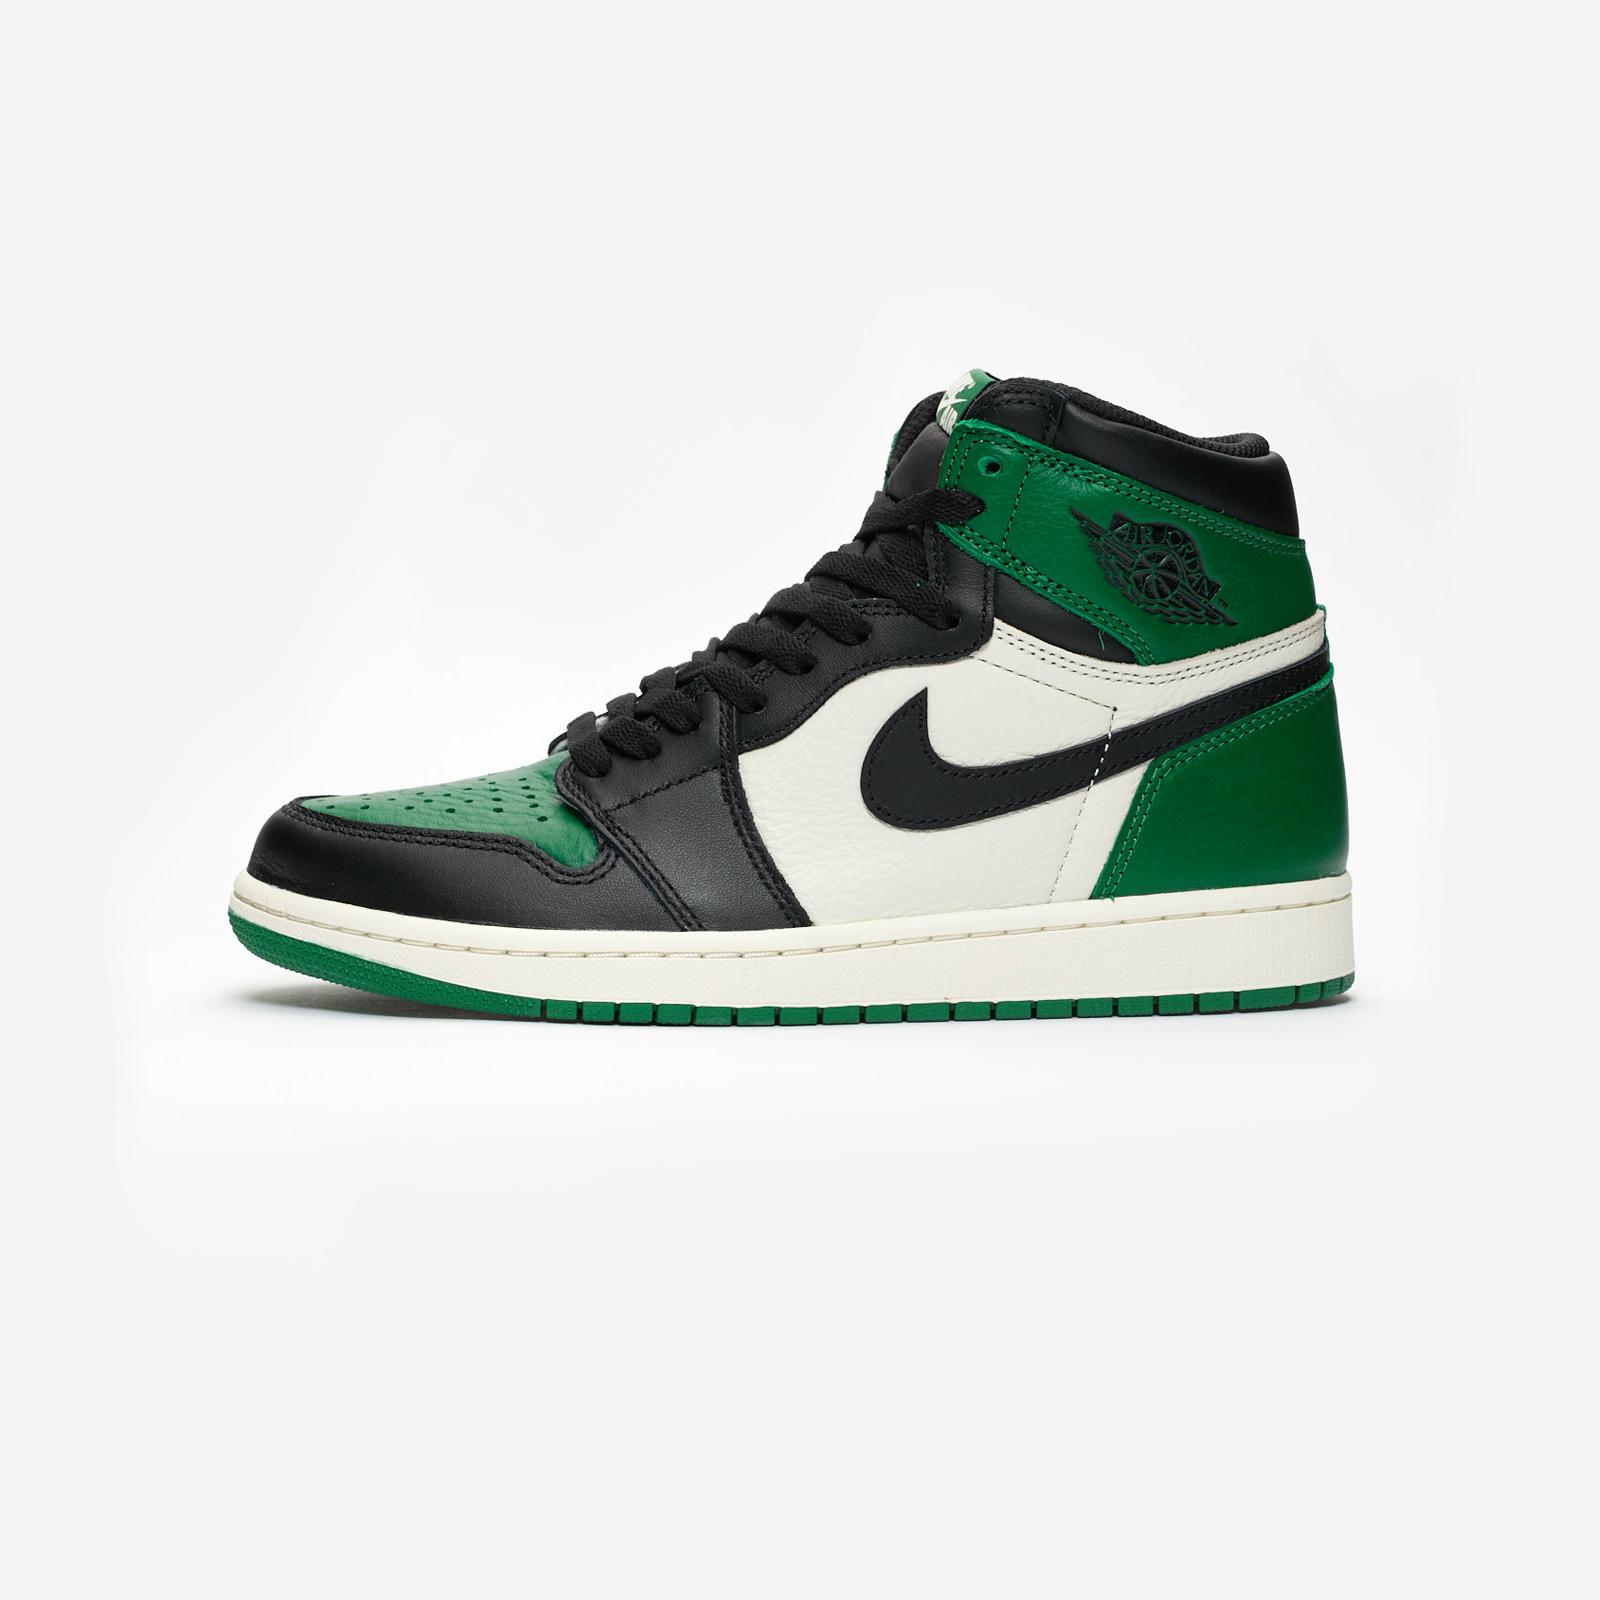 fc734a7f2e03aa Jordan Brand Air Jordan 1 Retro High OG - 555088-302 - Sneakersnstuff